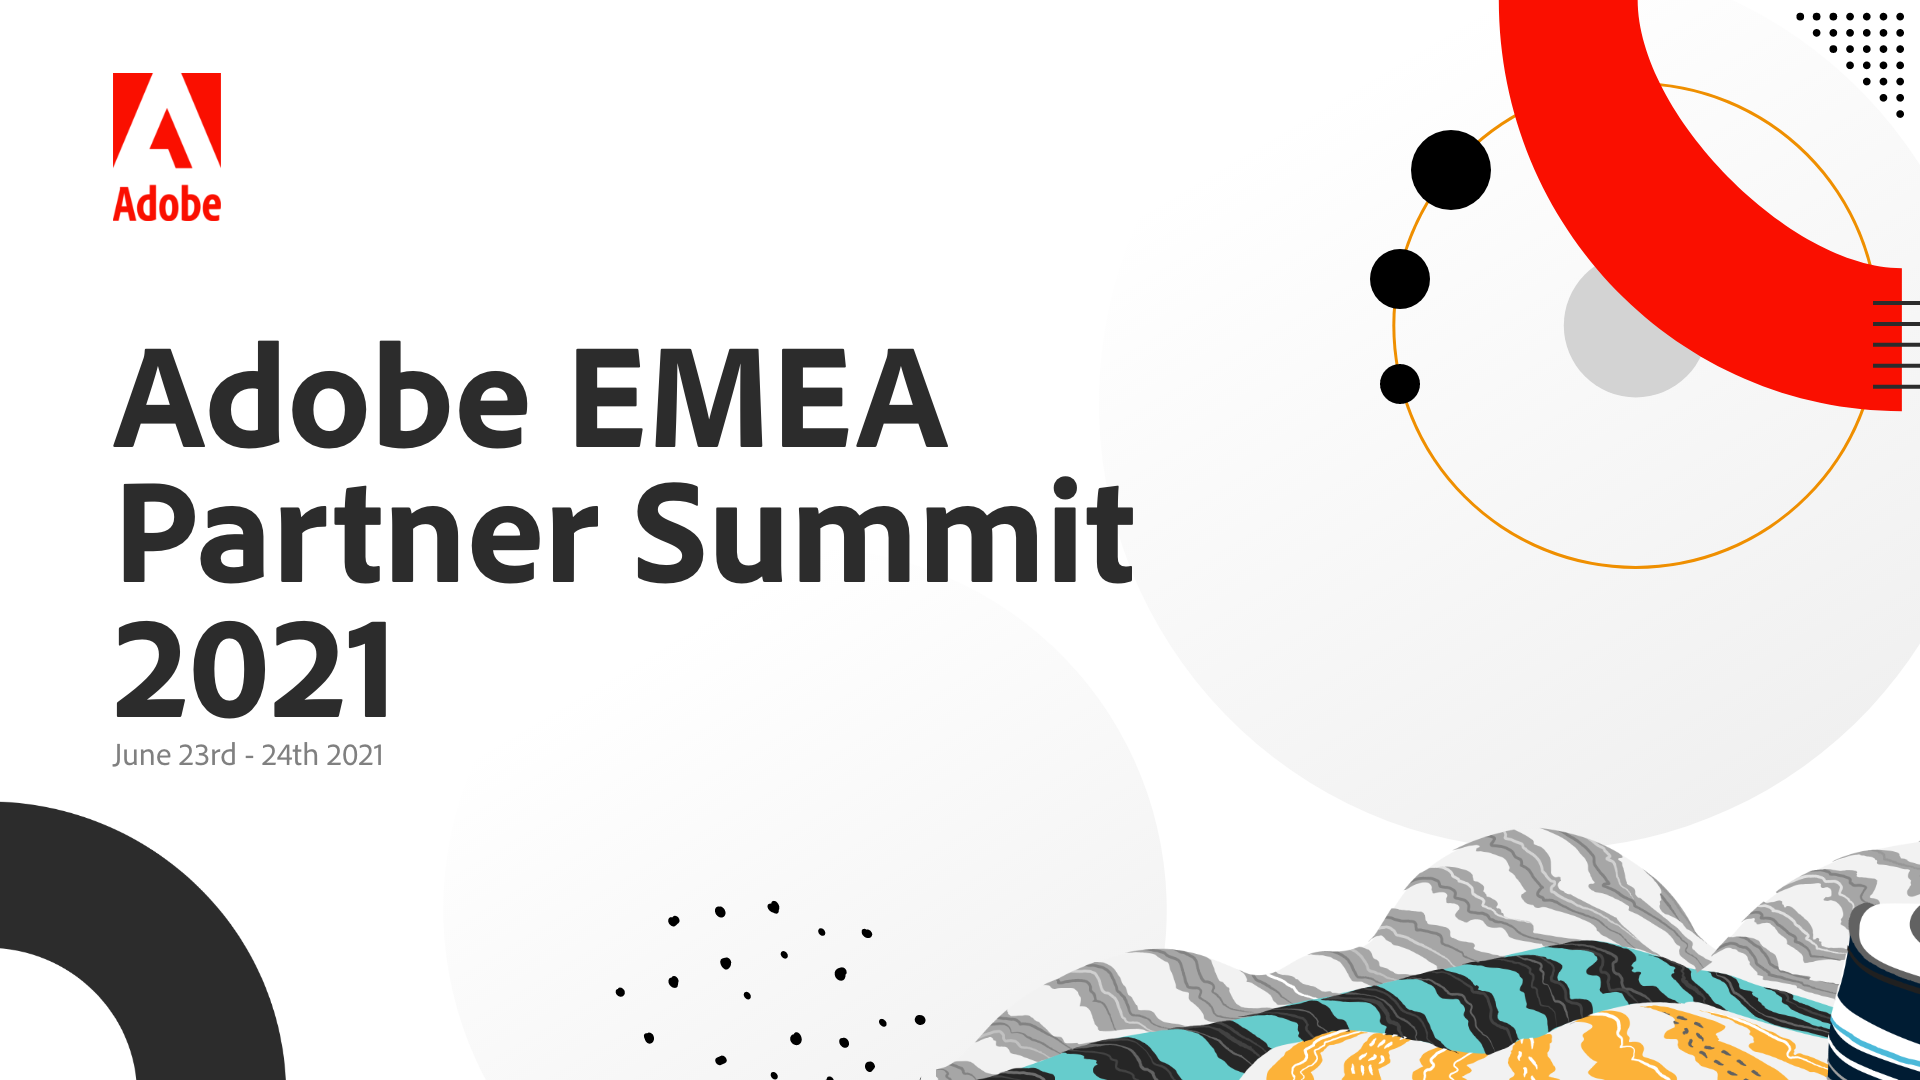 Adobe EMEA Partner Summit